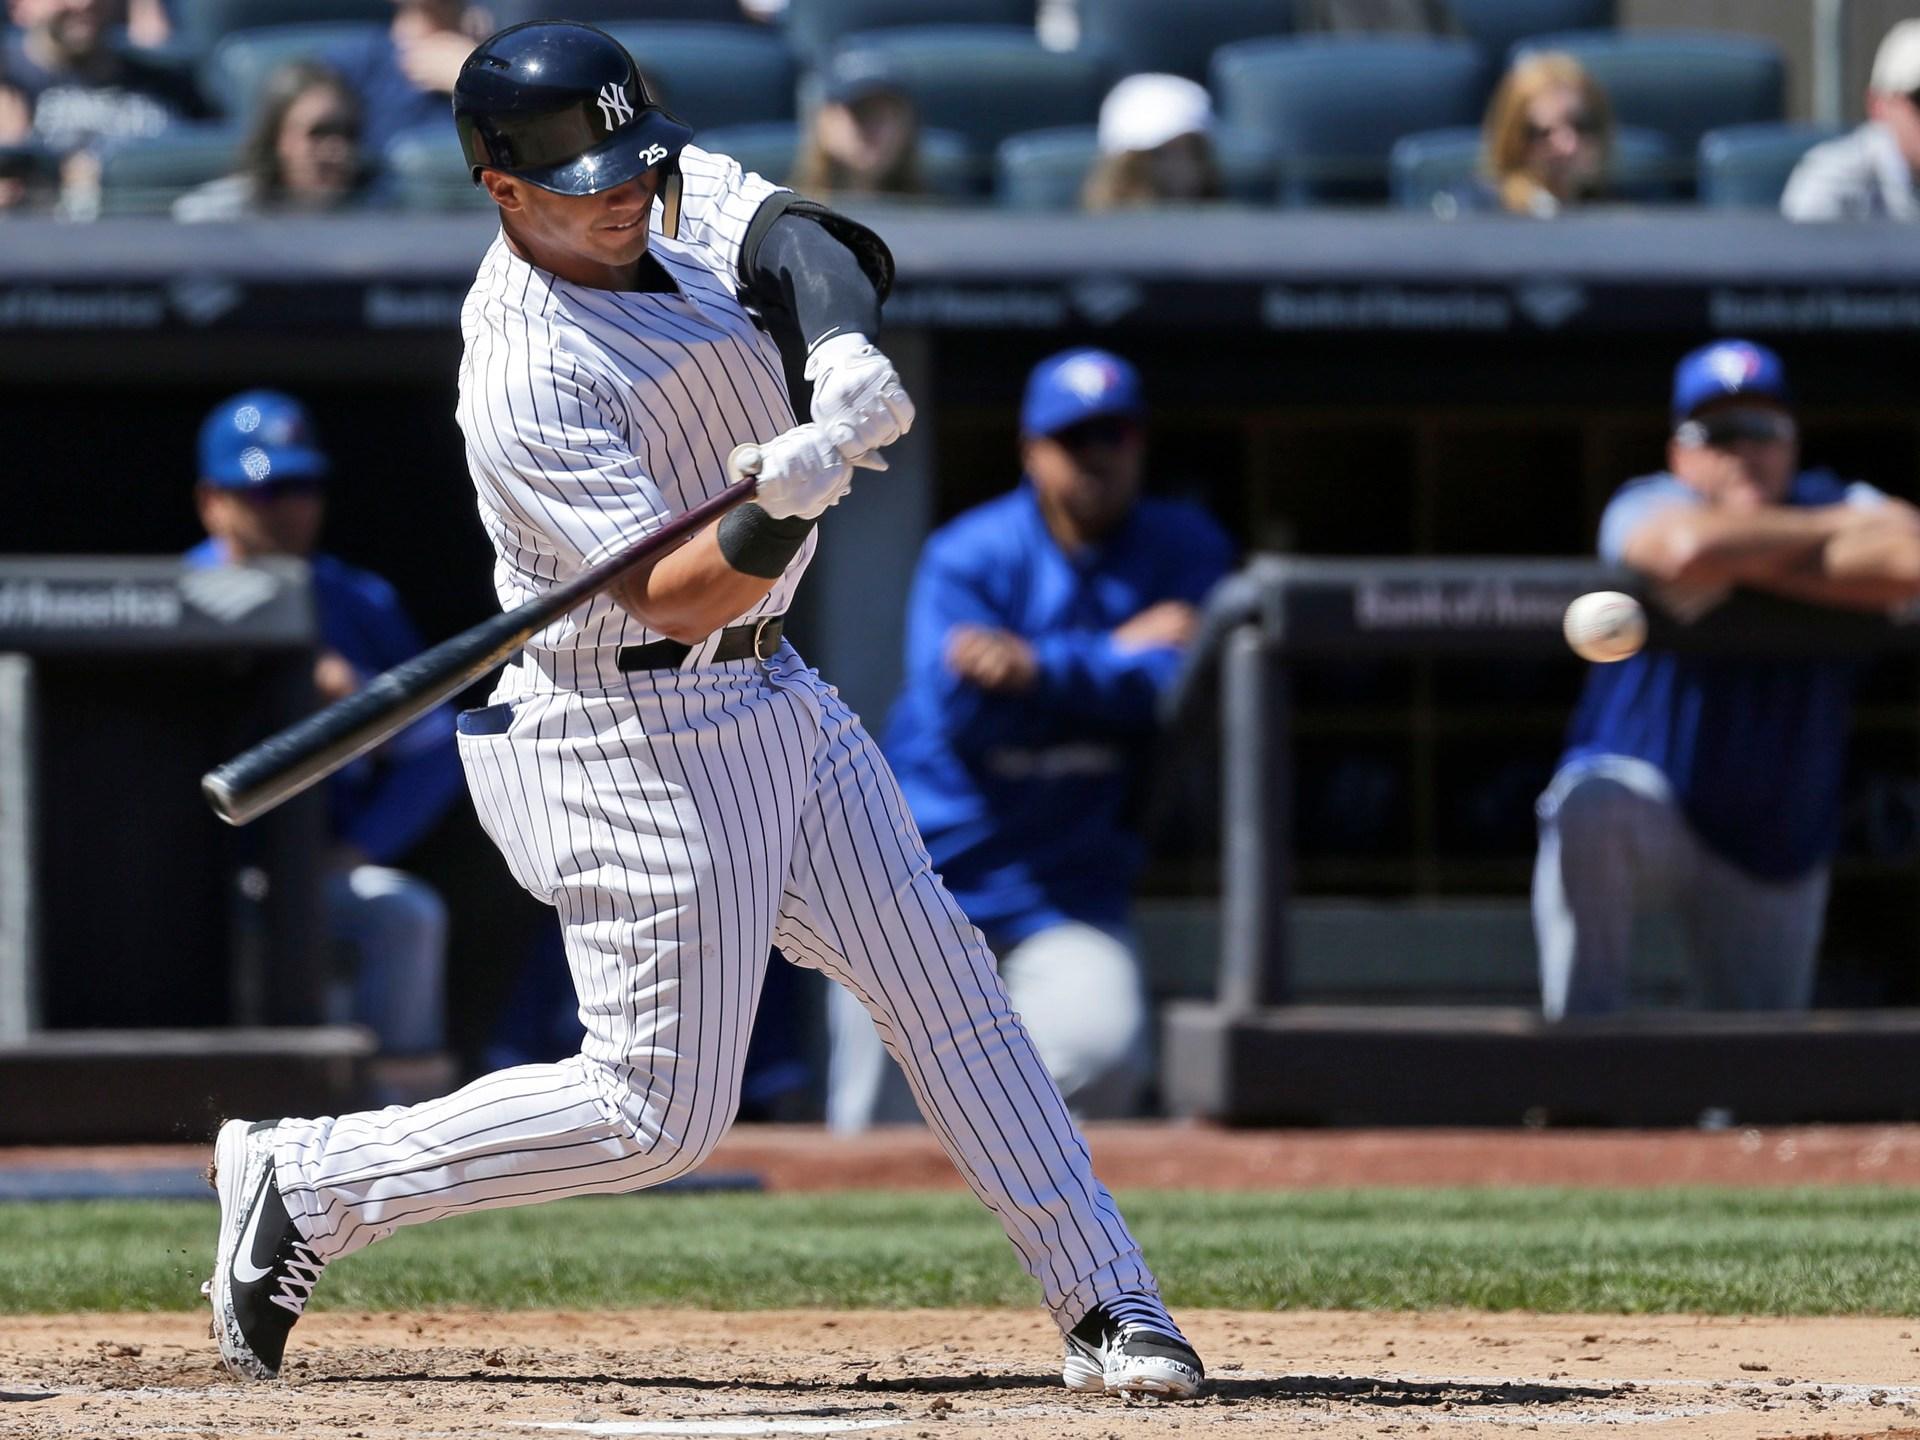 Blue Jays Yankees Baseball_1524431733213